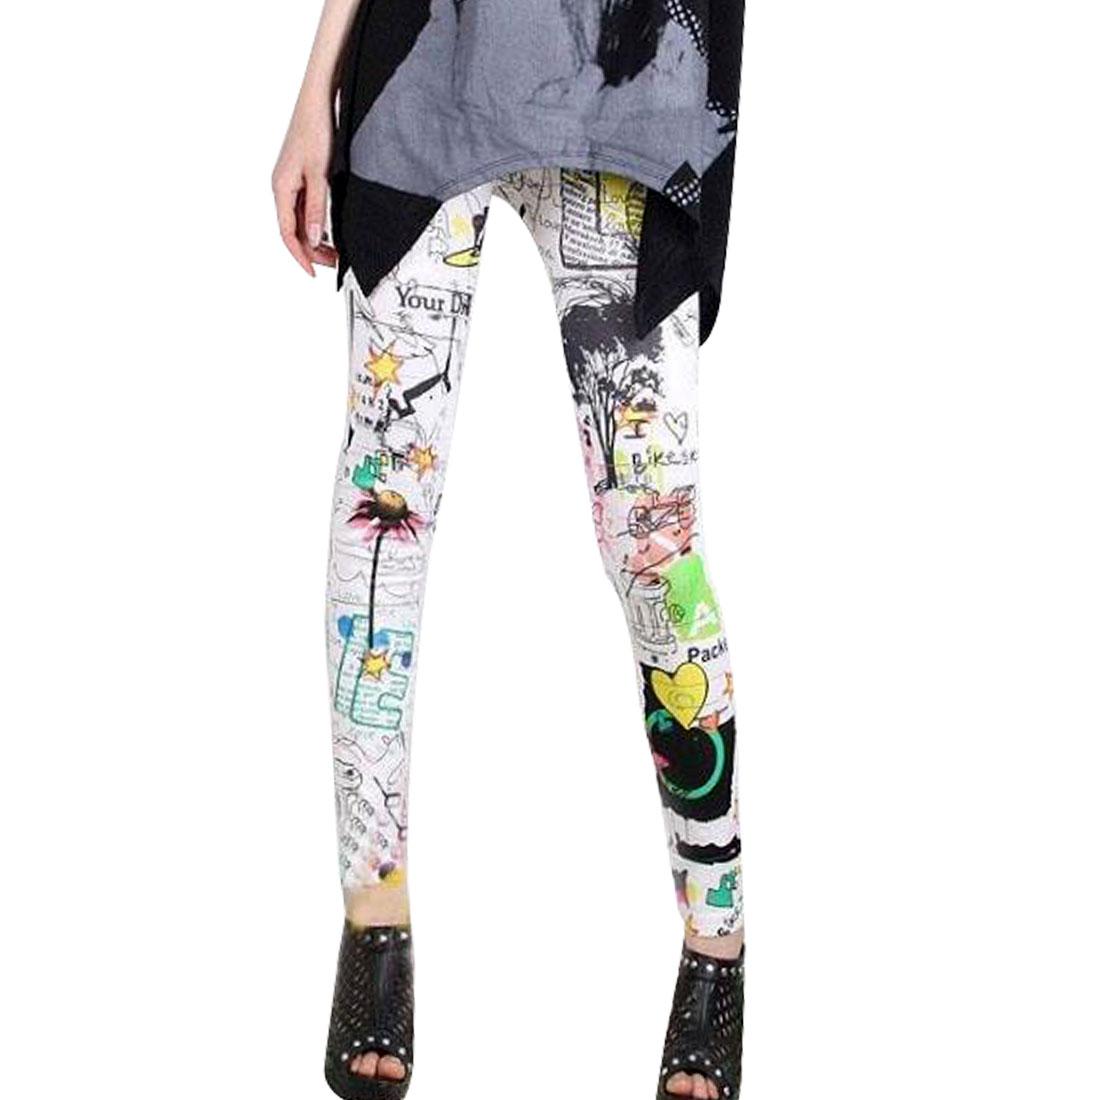 Ladies Sunflower Pattern No Seam Side Stylish Leggings Colorful S